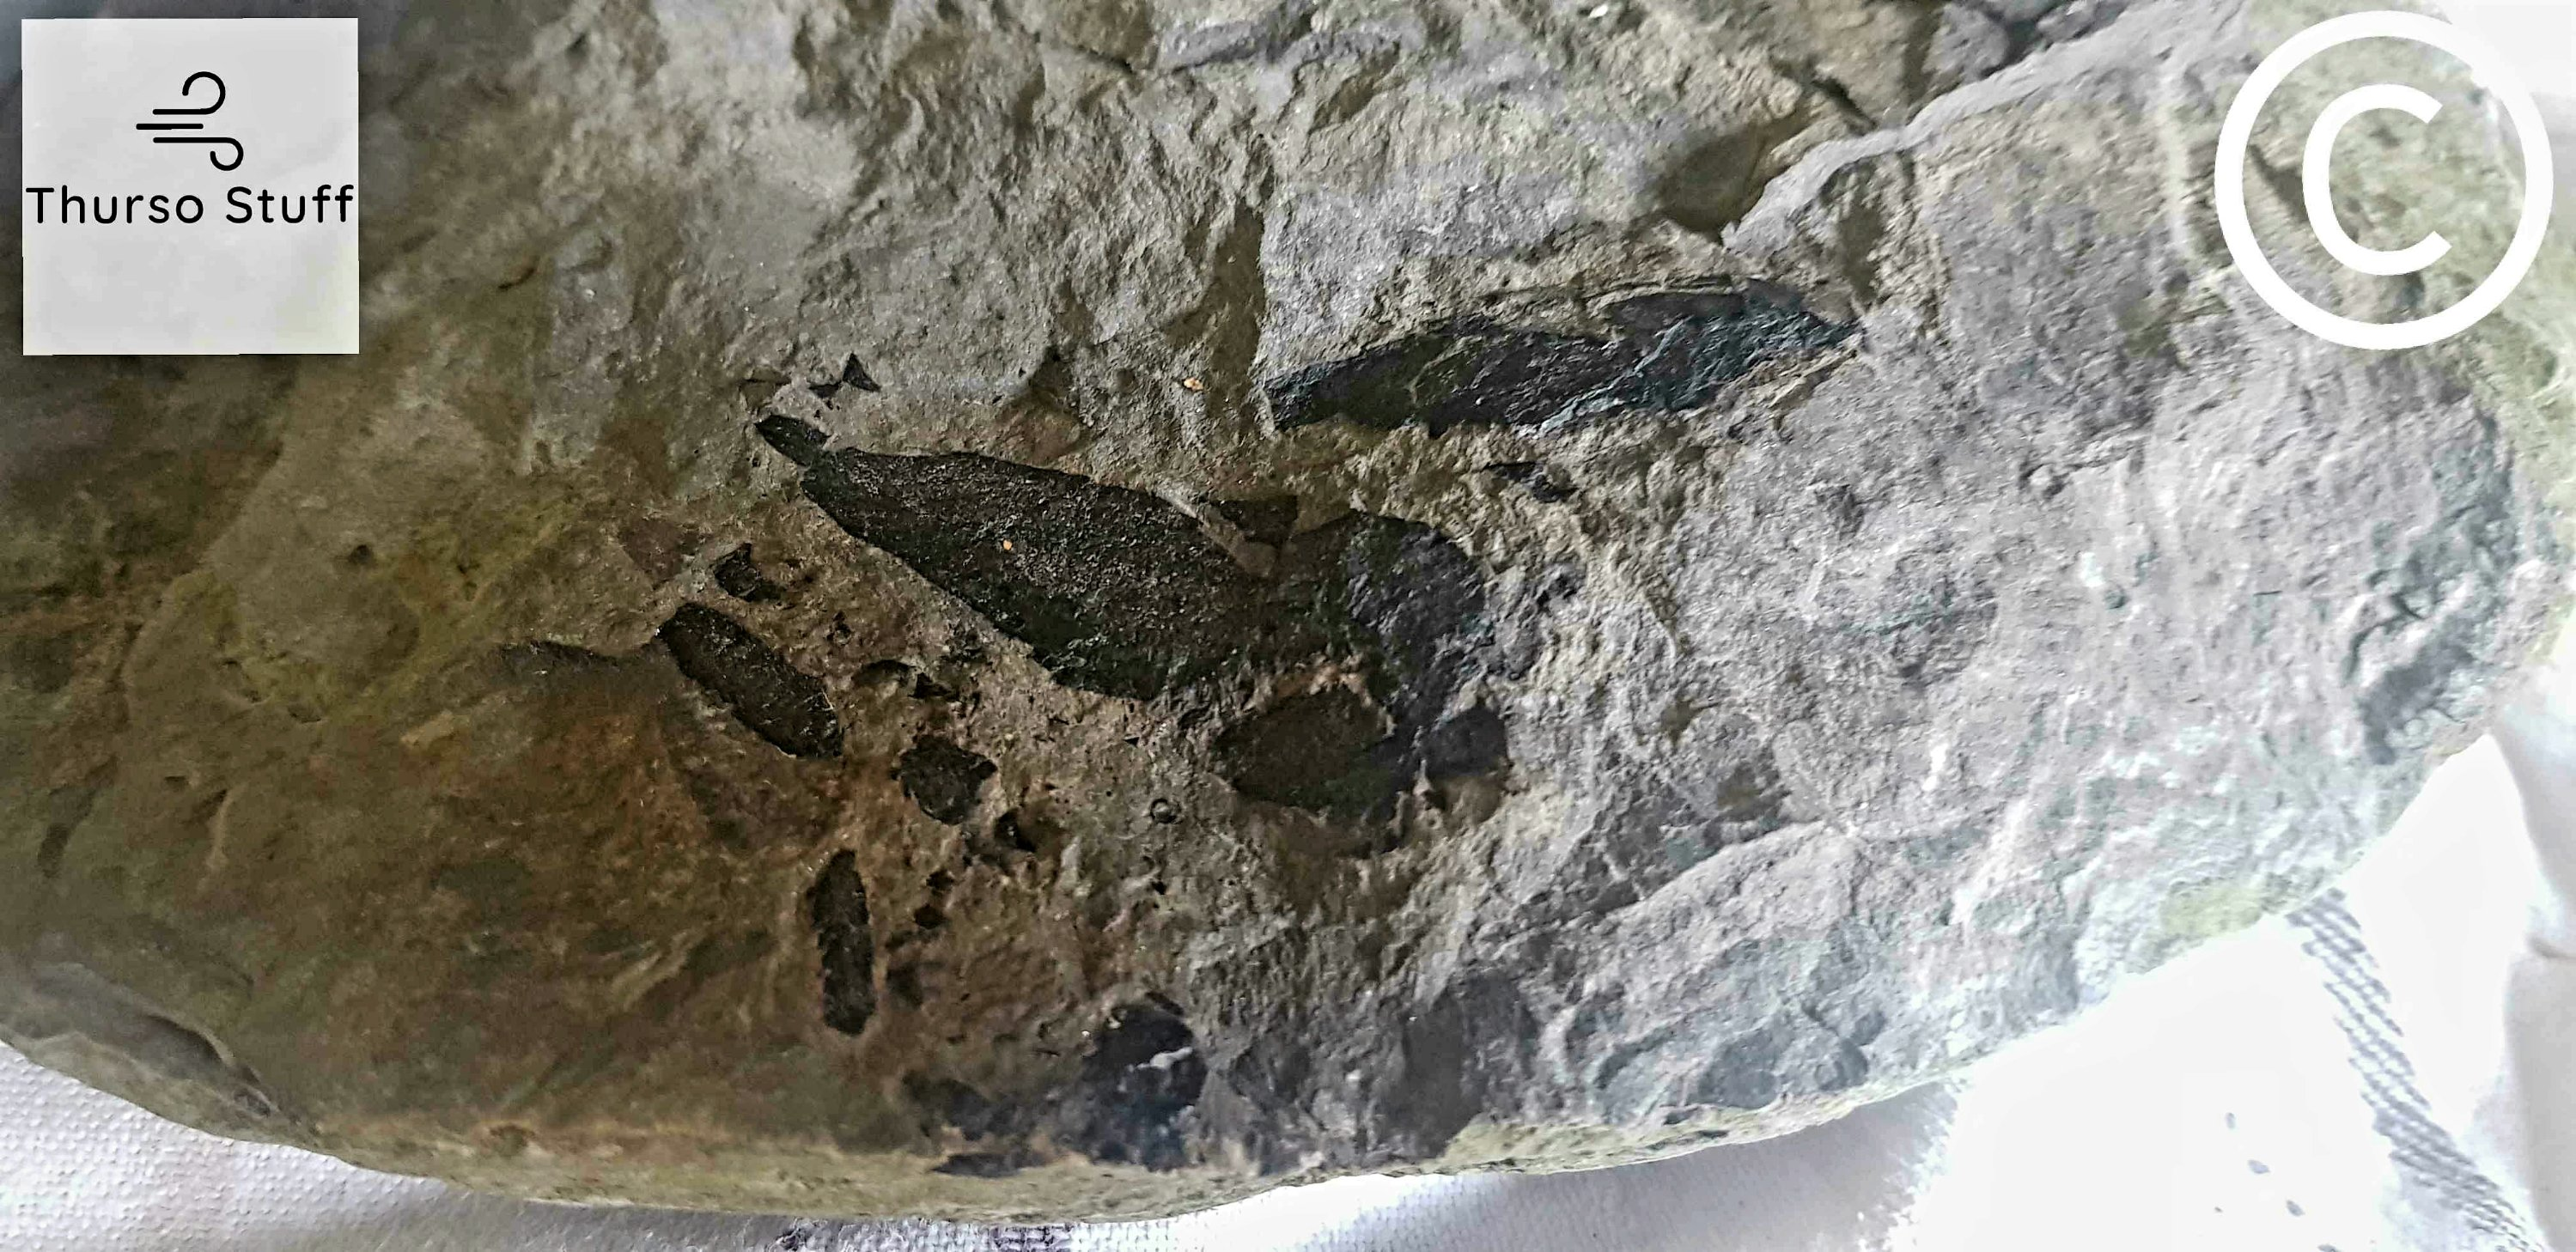 a black fish fossil on a grey rock